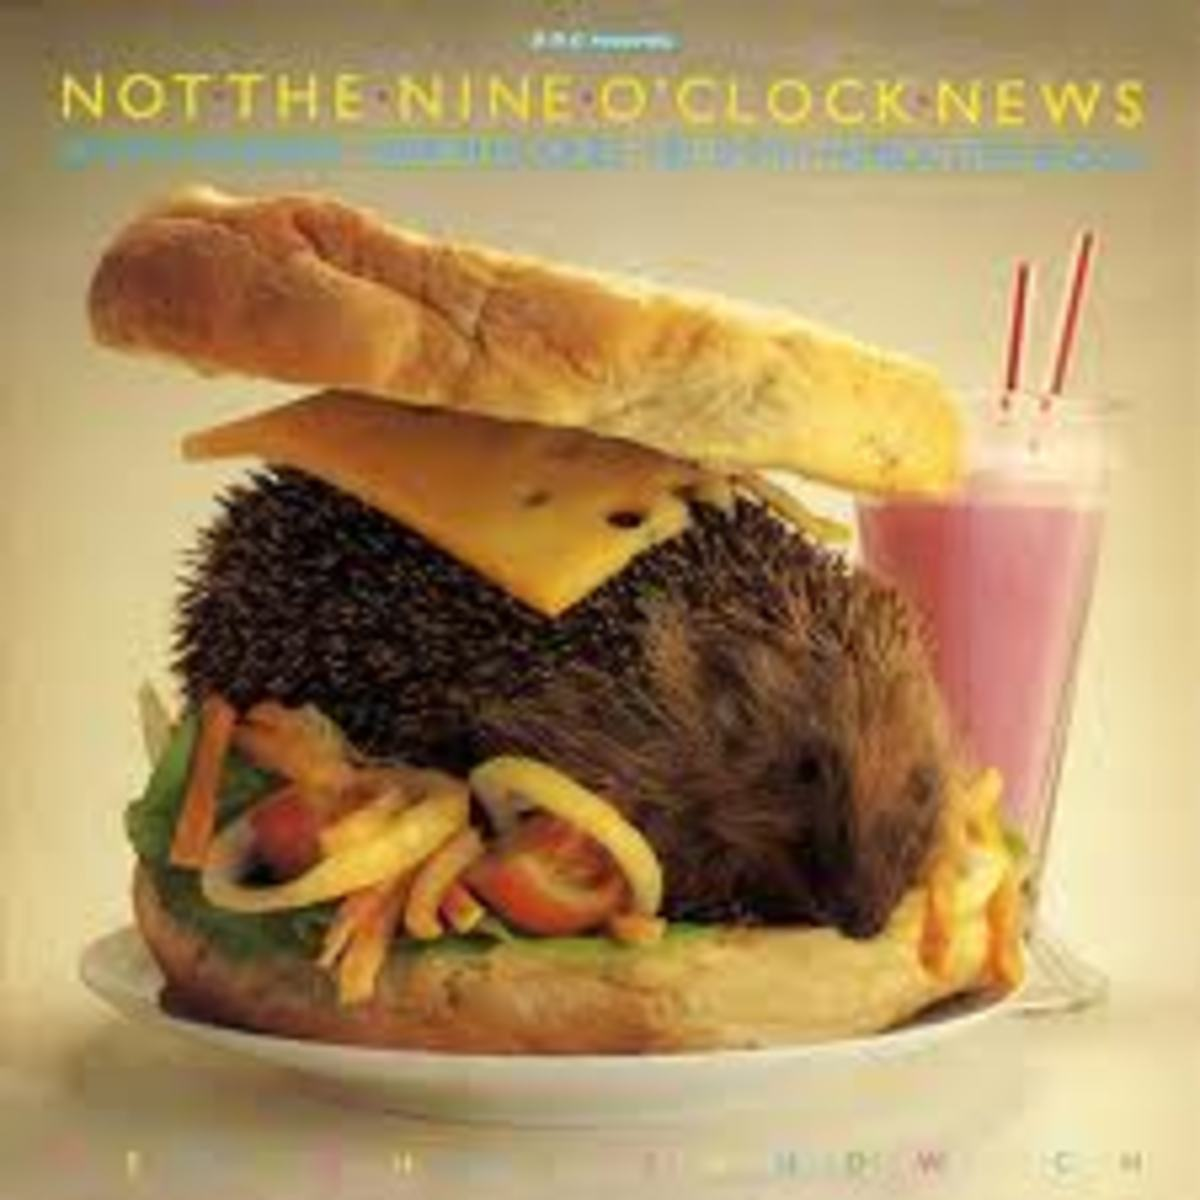 Not the Nine O'clock News - Hedgehog Sandwich